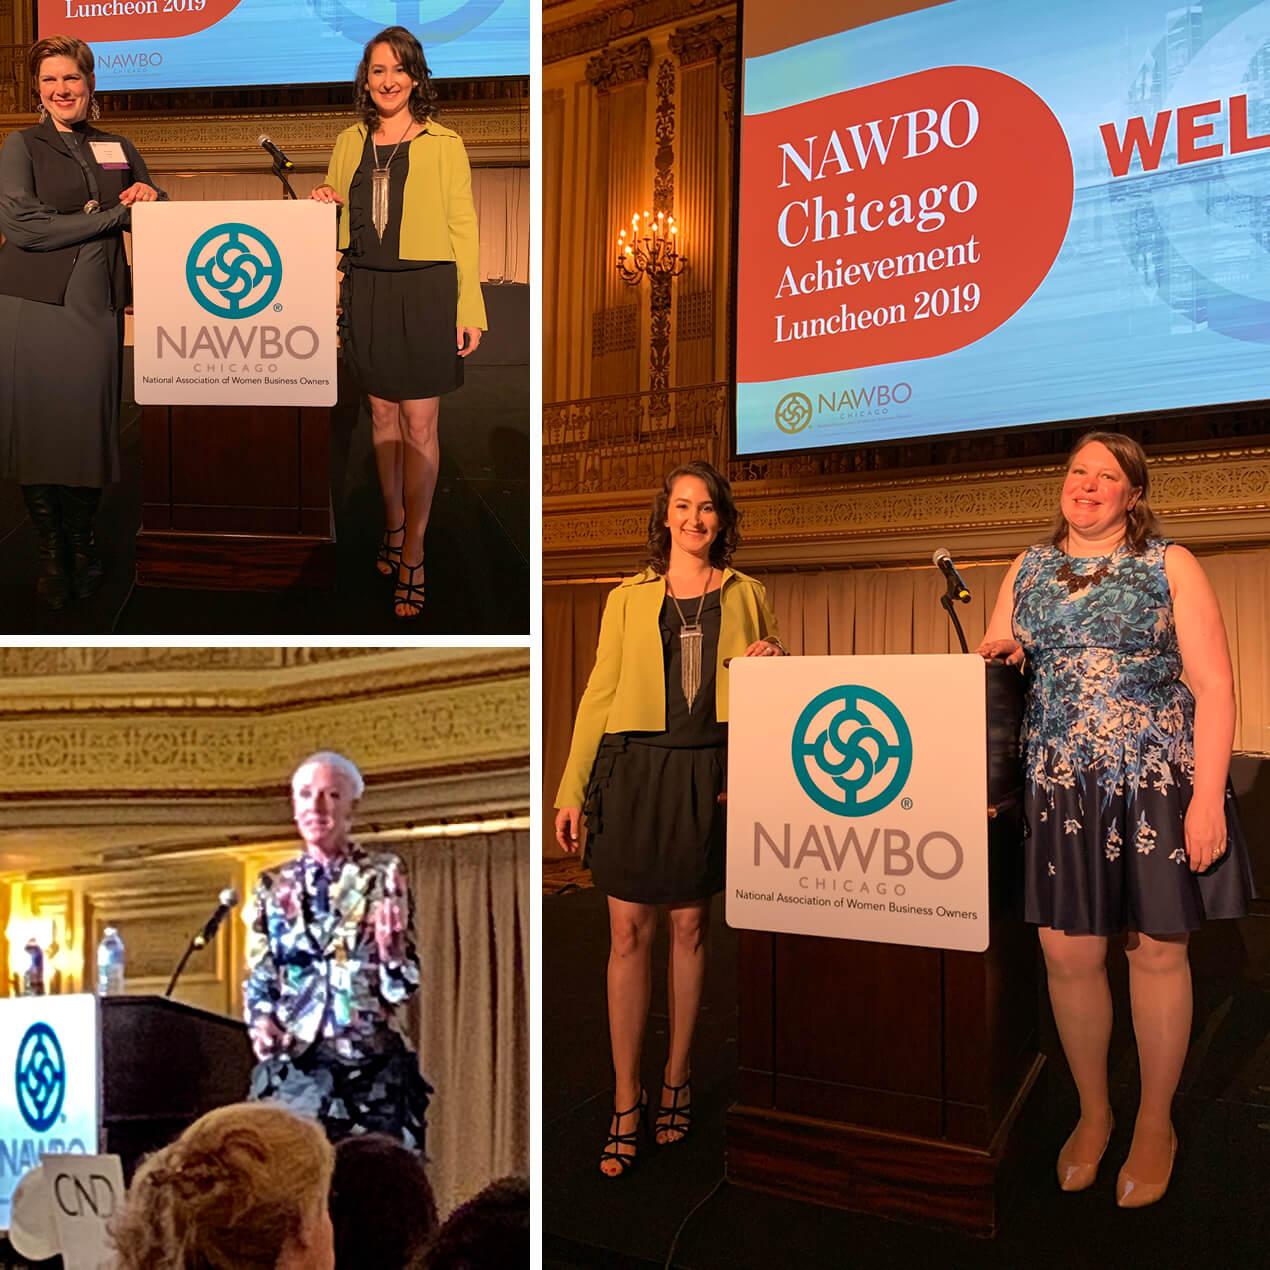 Michele Katz, Advitam IP, Joins Parade of Presidents at NAWBO Chicago Achievement Luncheon